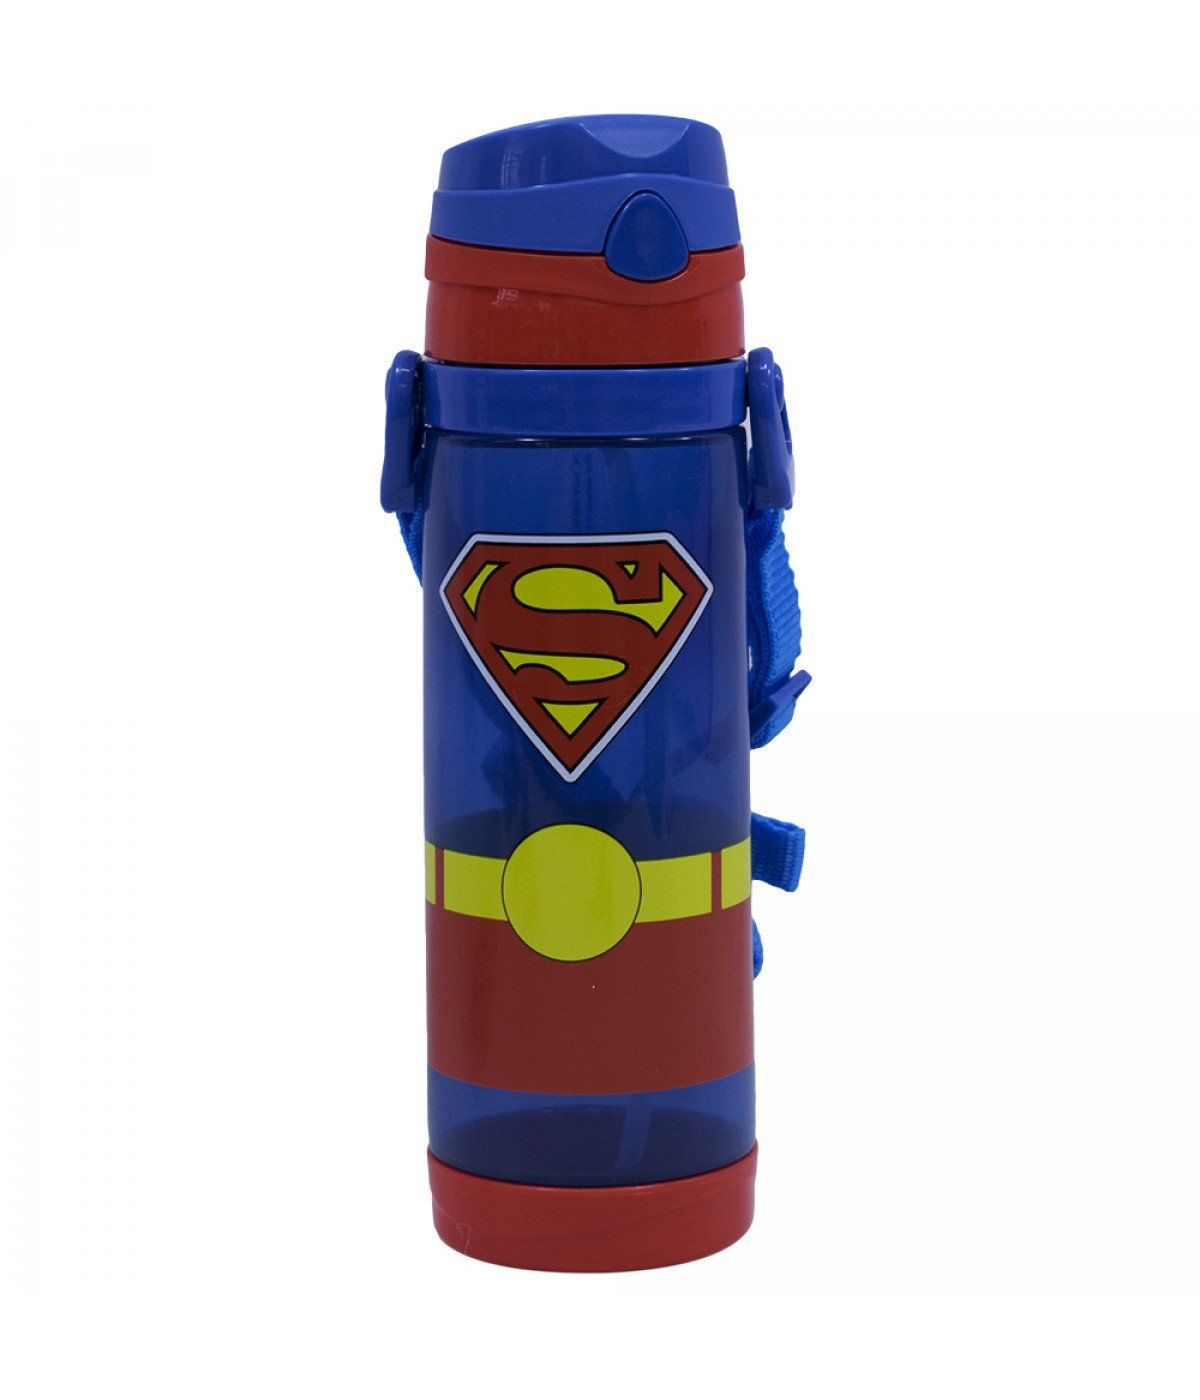 Garrafa de Plástico Super-Homem: DC Super Friends